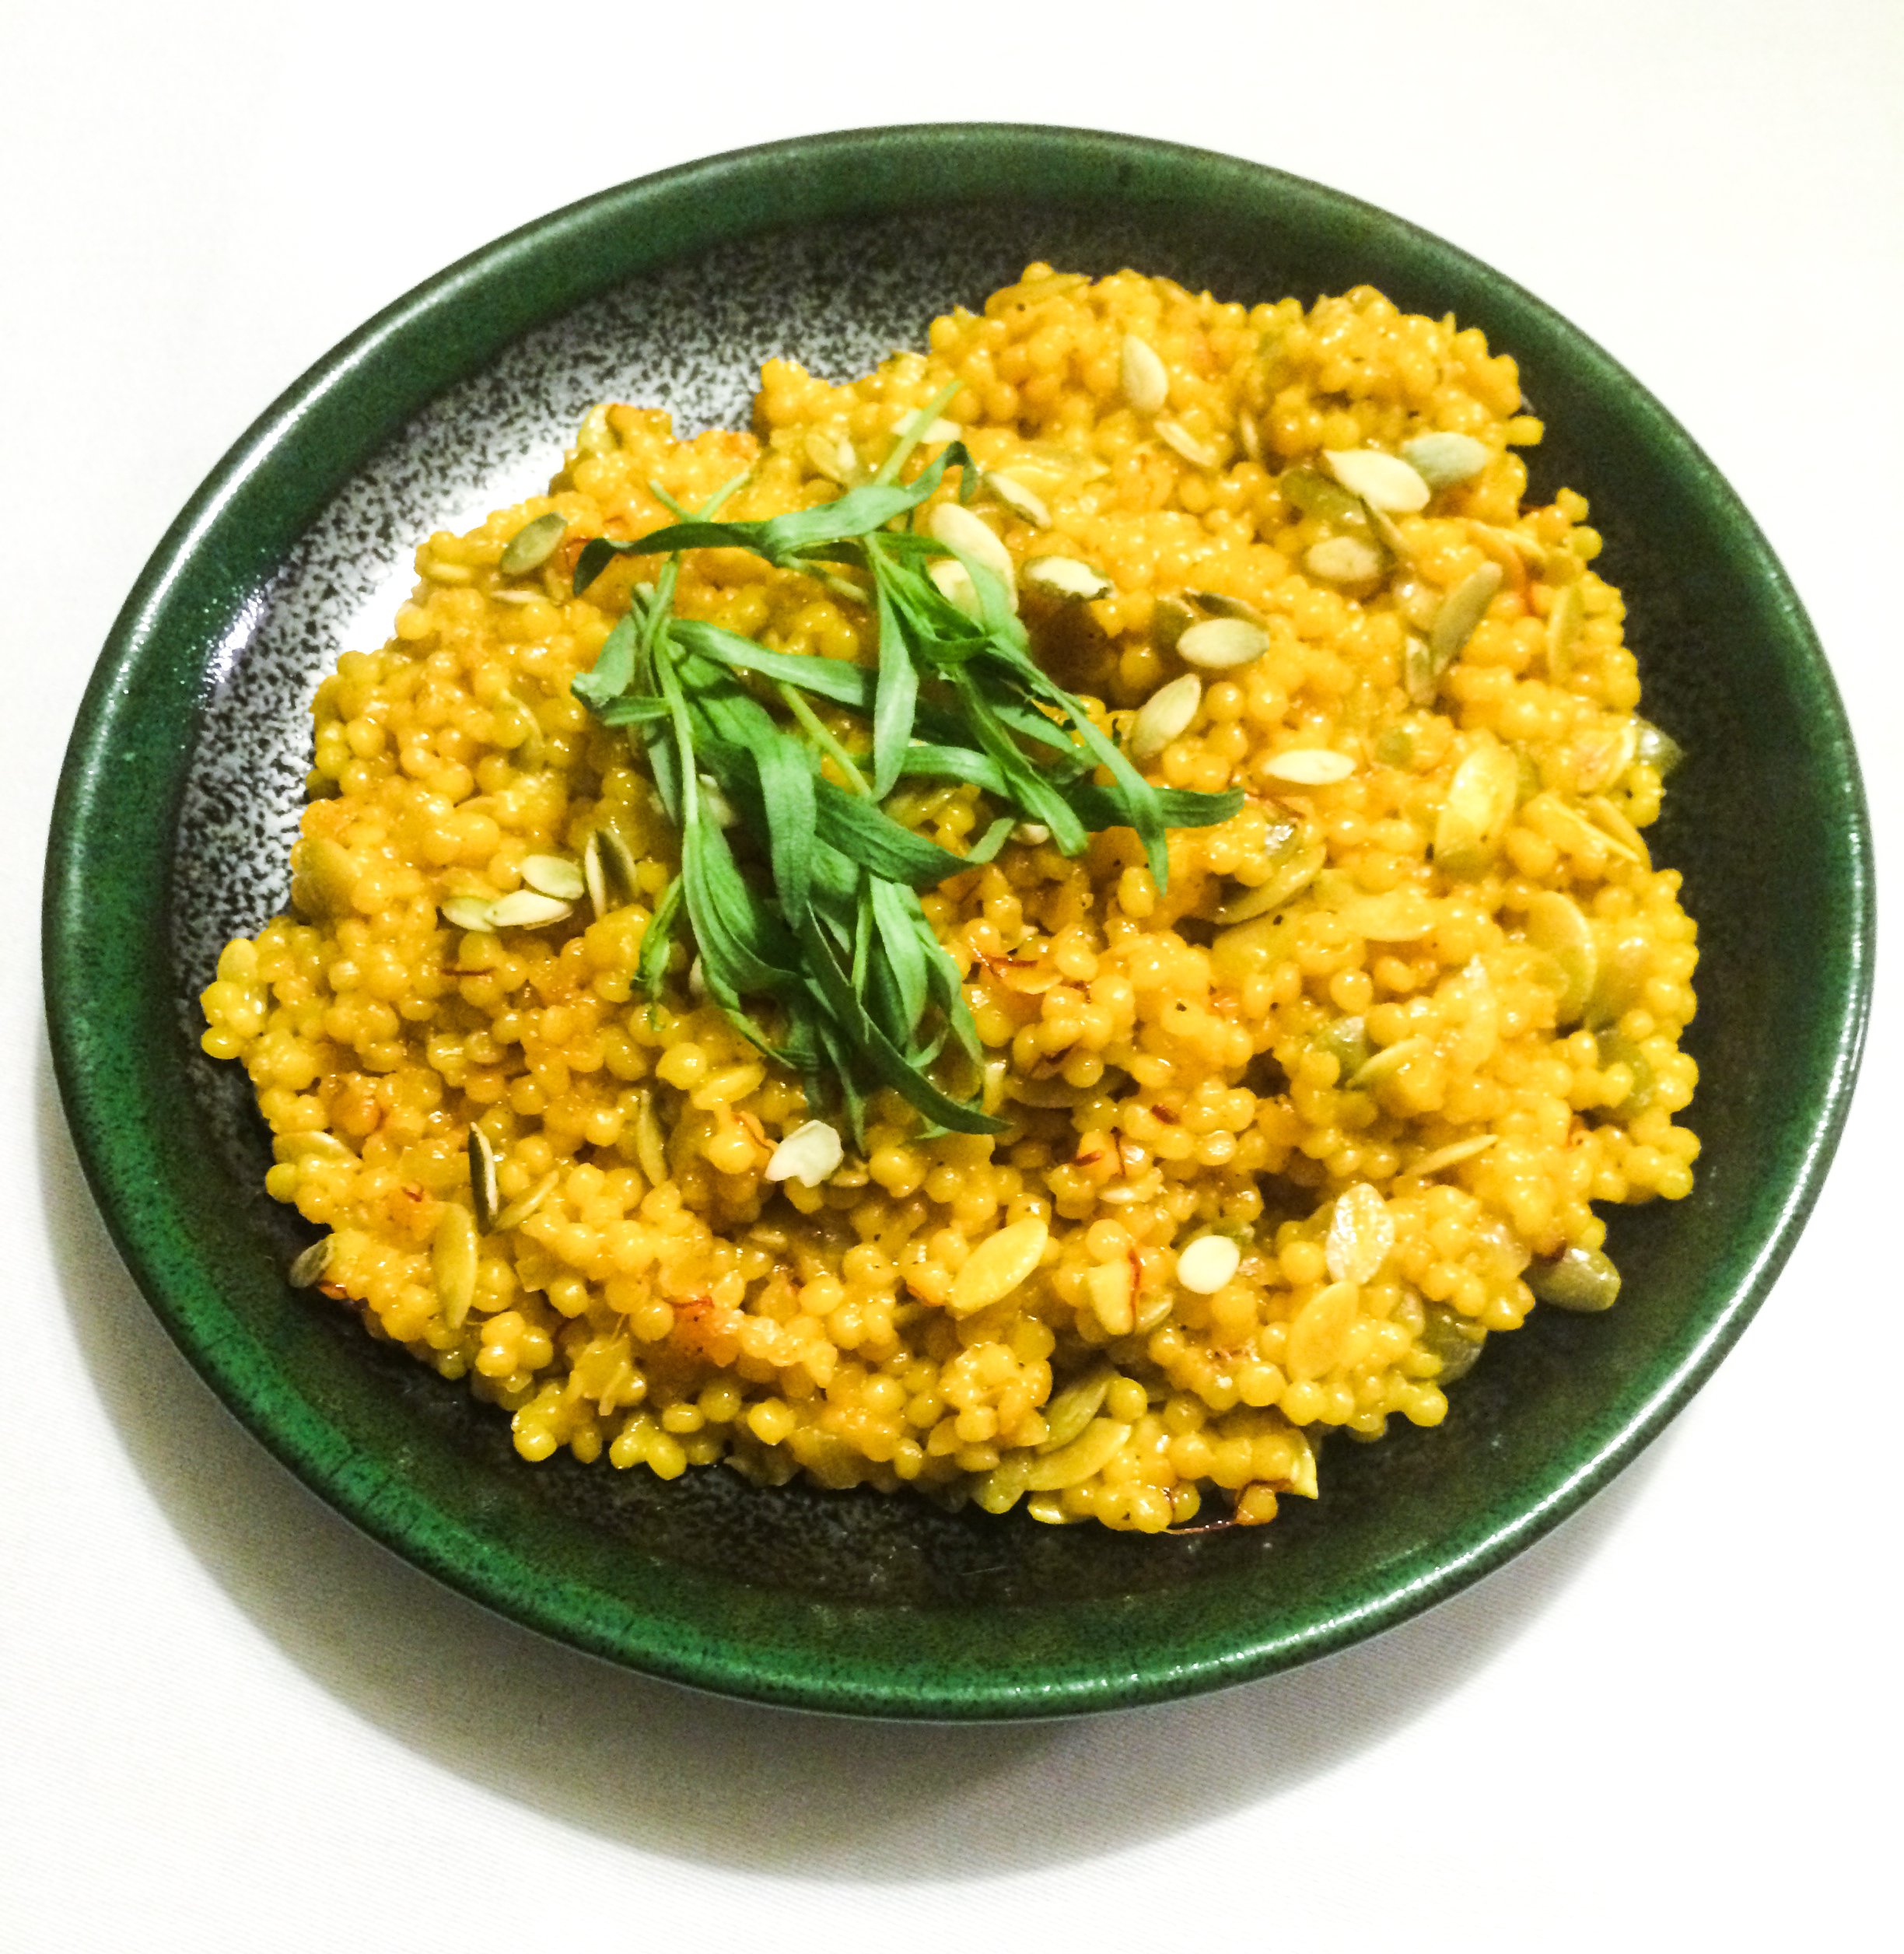 Middle Eastern Couscous with Saffron